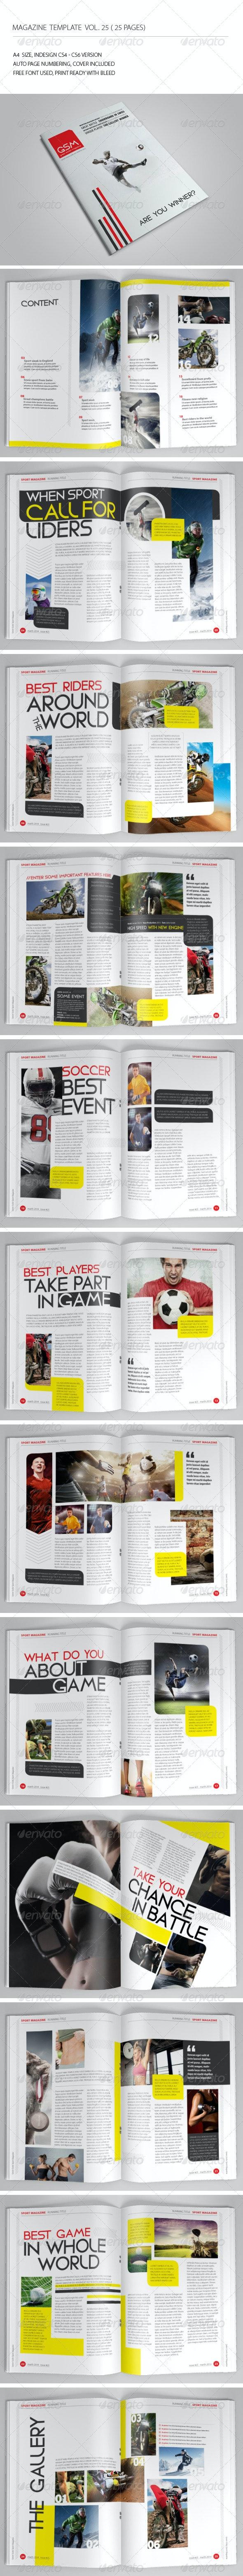 25 Pages Sport Magazine Vol25 - Magazines Print Templates